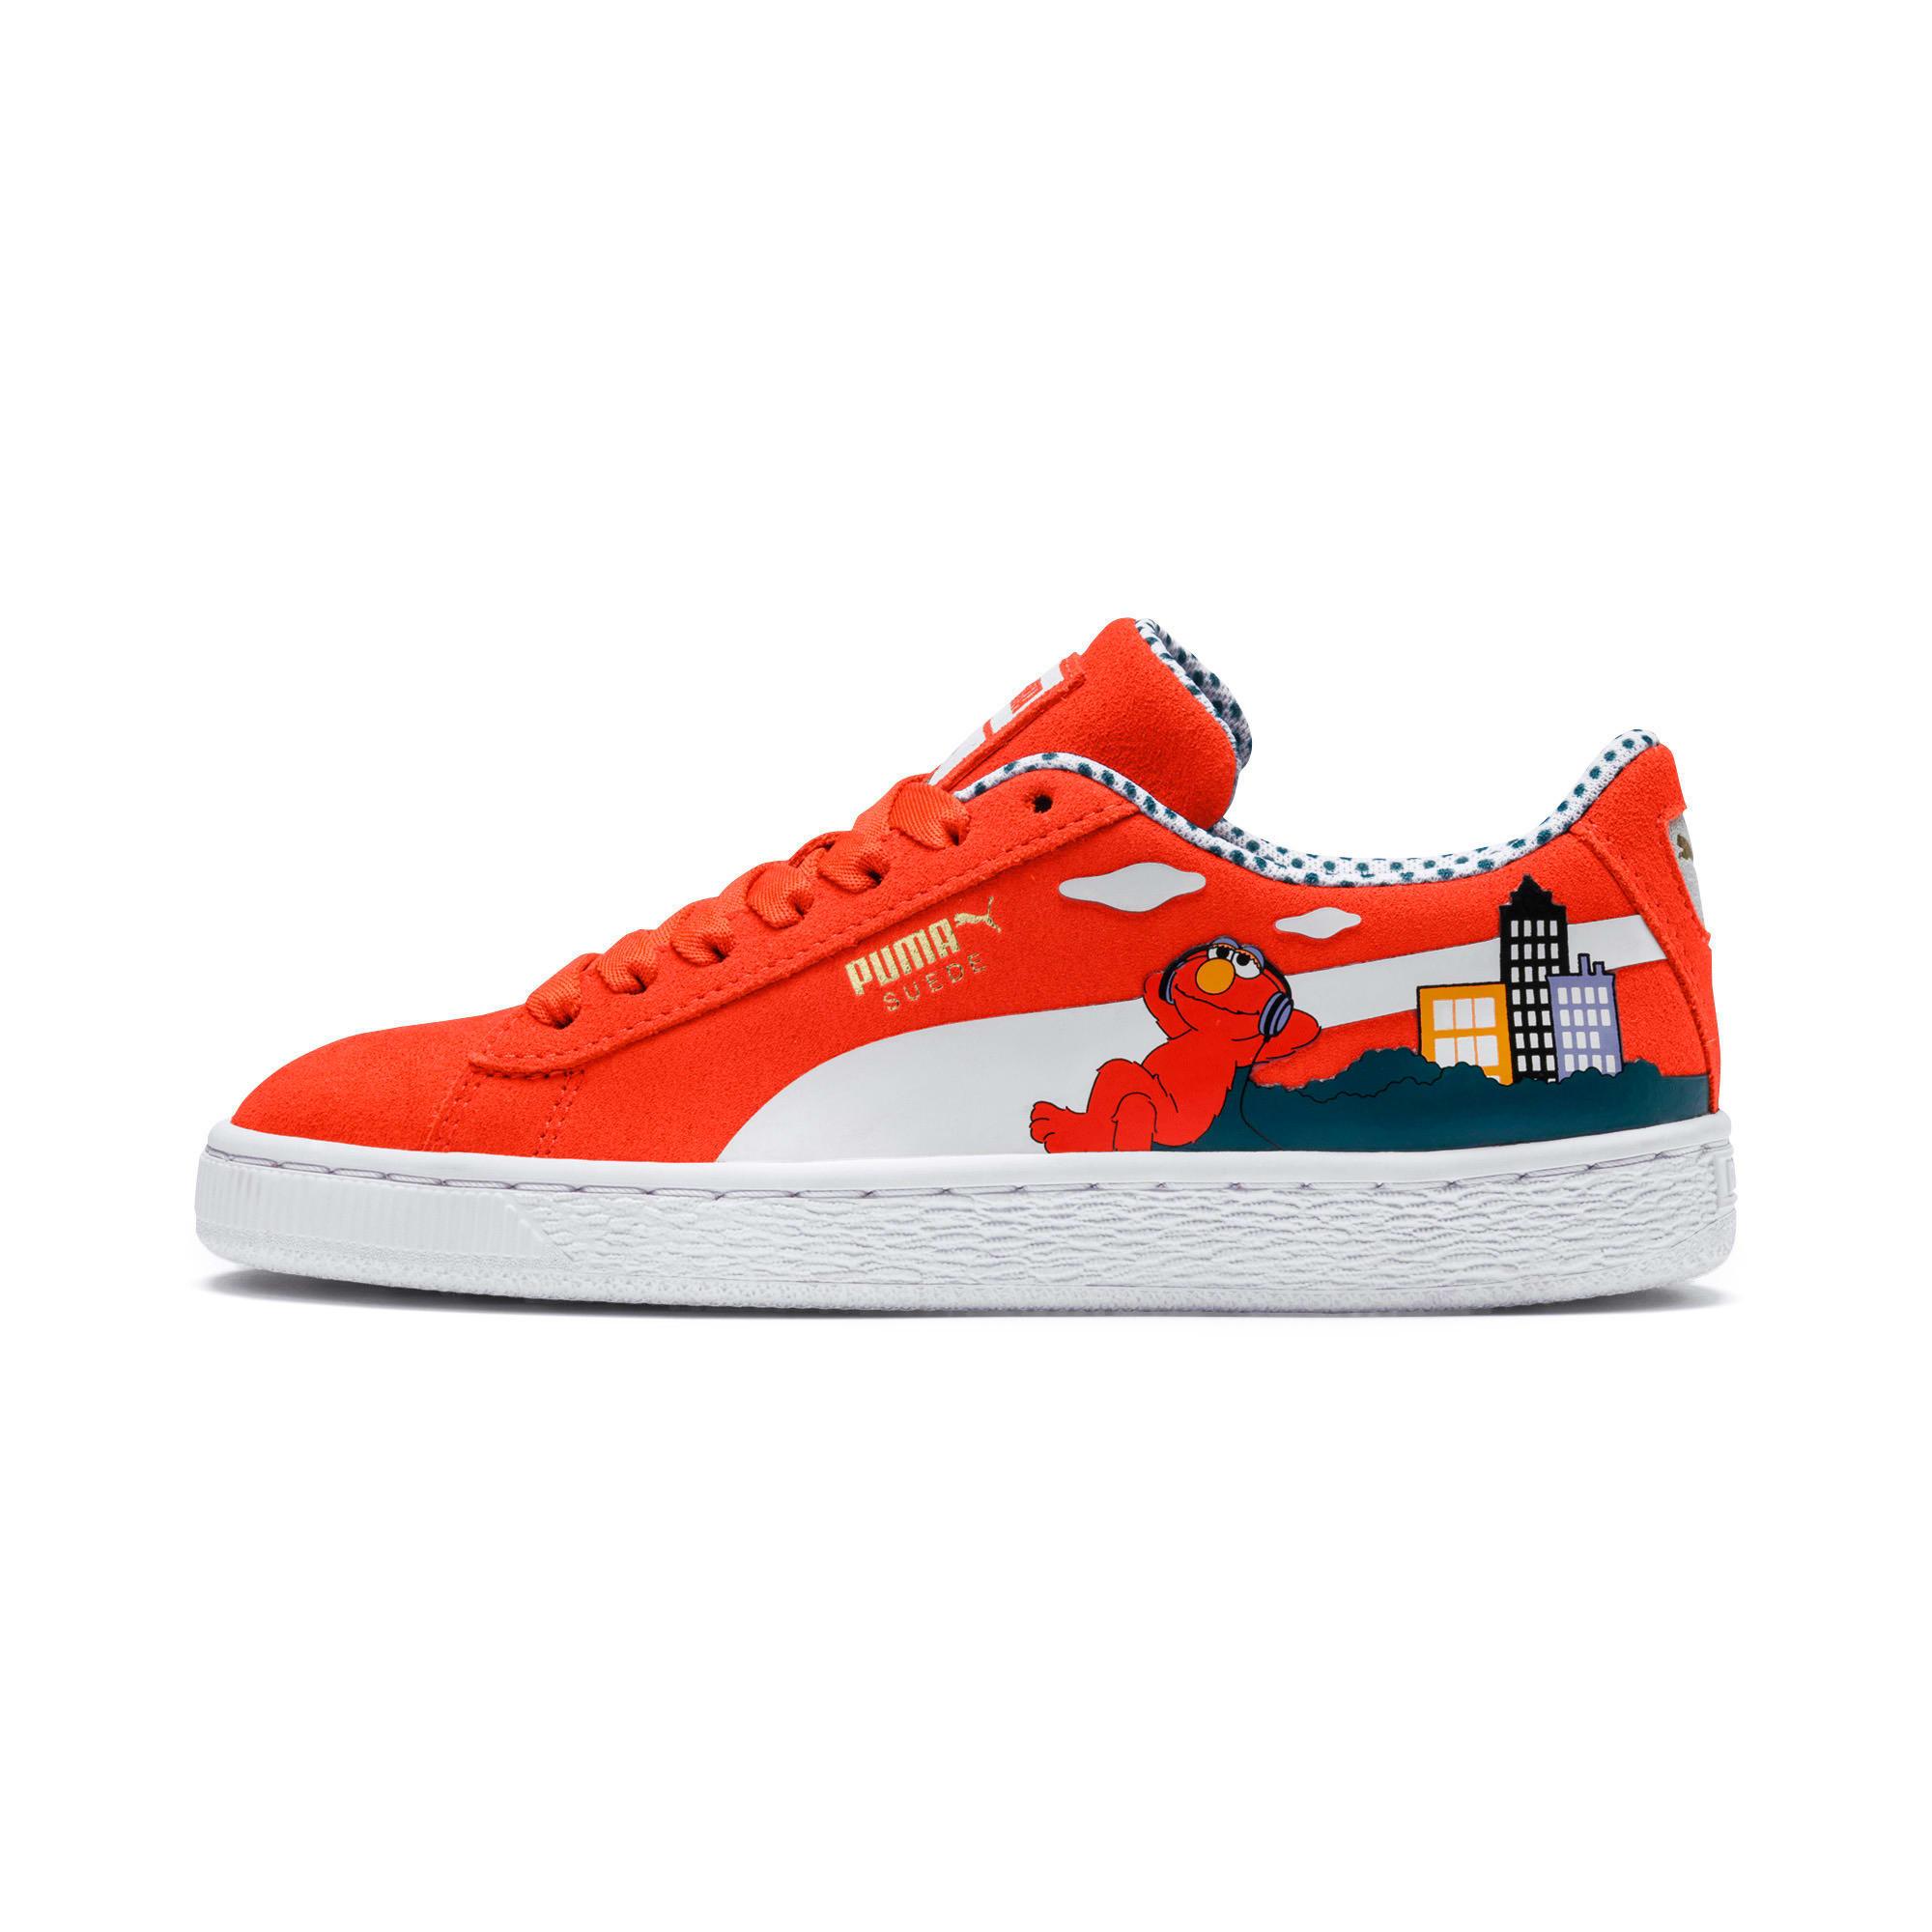 Thumbnail 1 of Sesame Street 50 Suede Little Kids' Shoes, Cherry Tomato-Puma White, medium